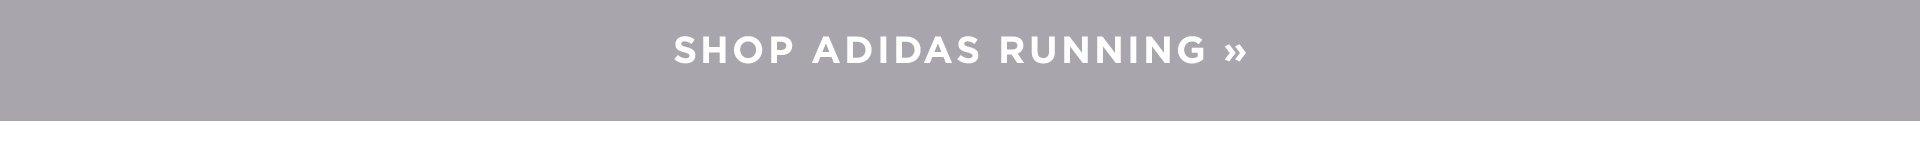 Shop Adidas Running